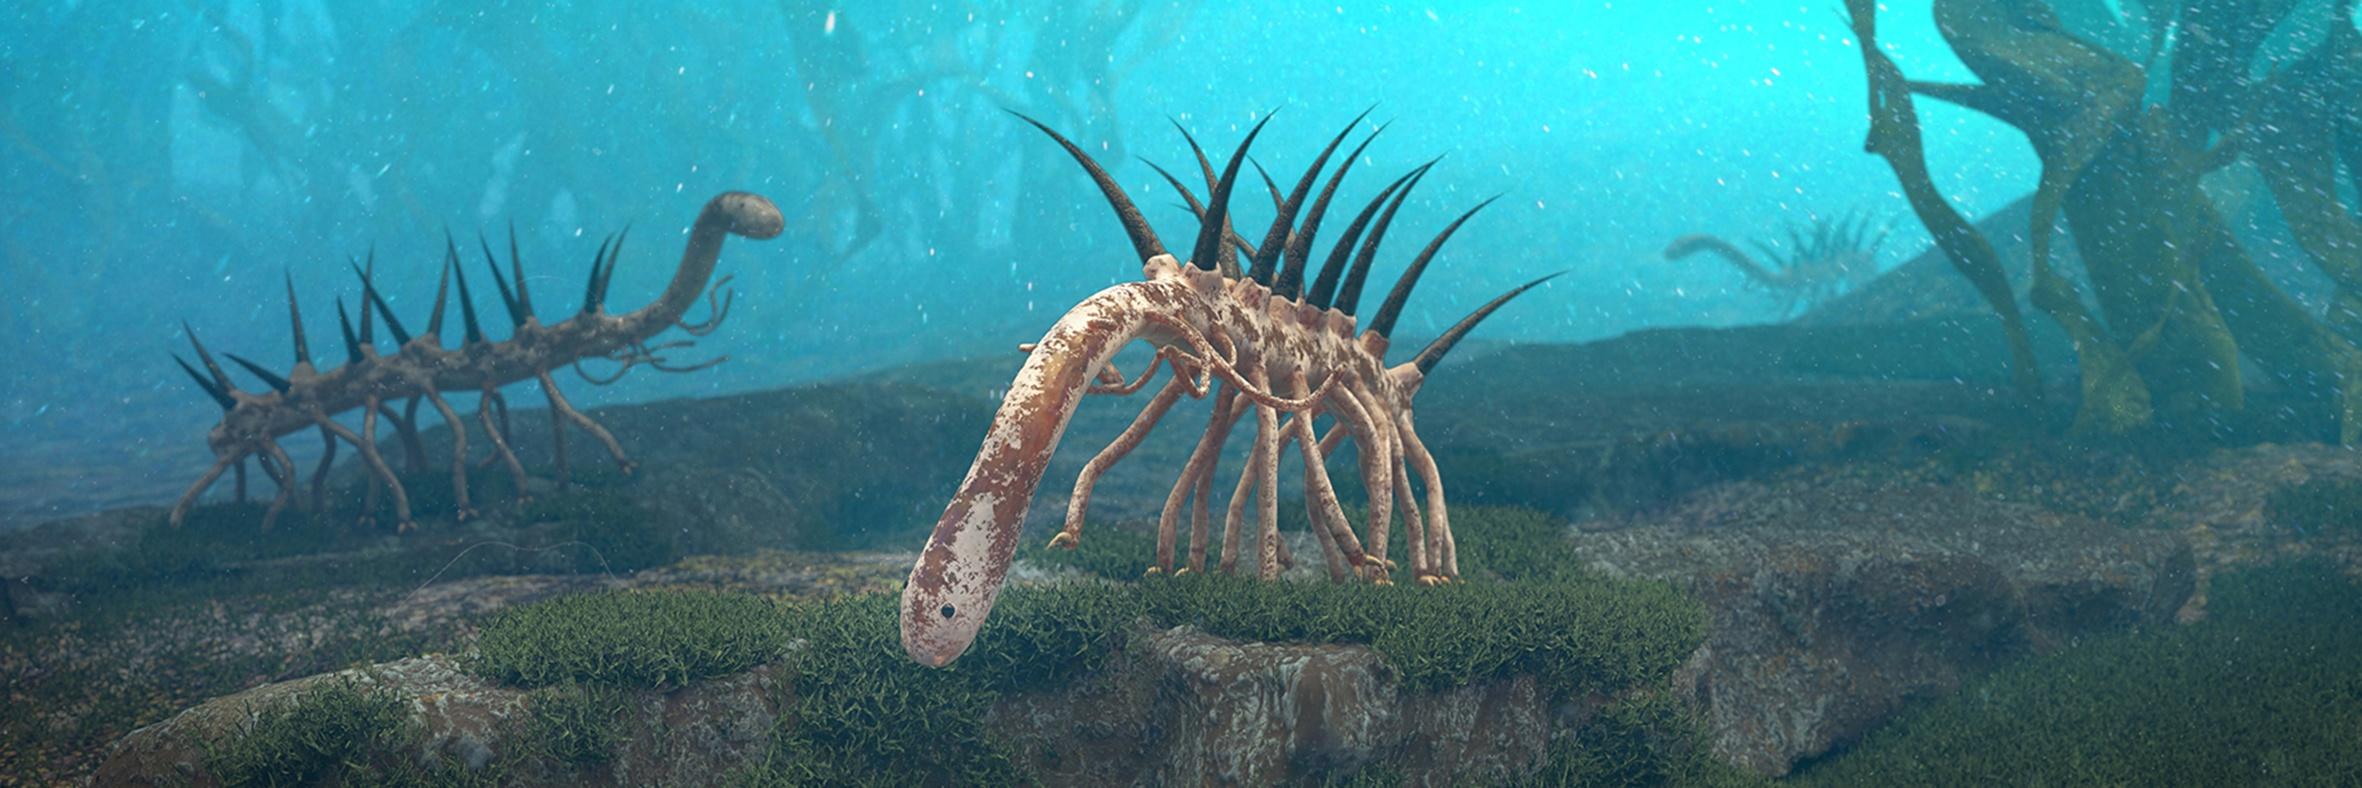 The spiky 14-legged Hallucigenia